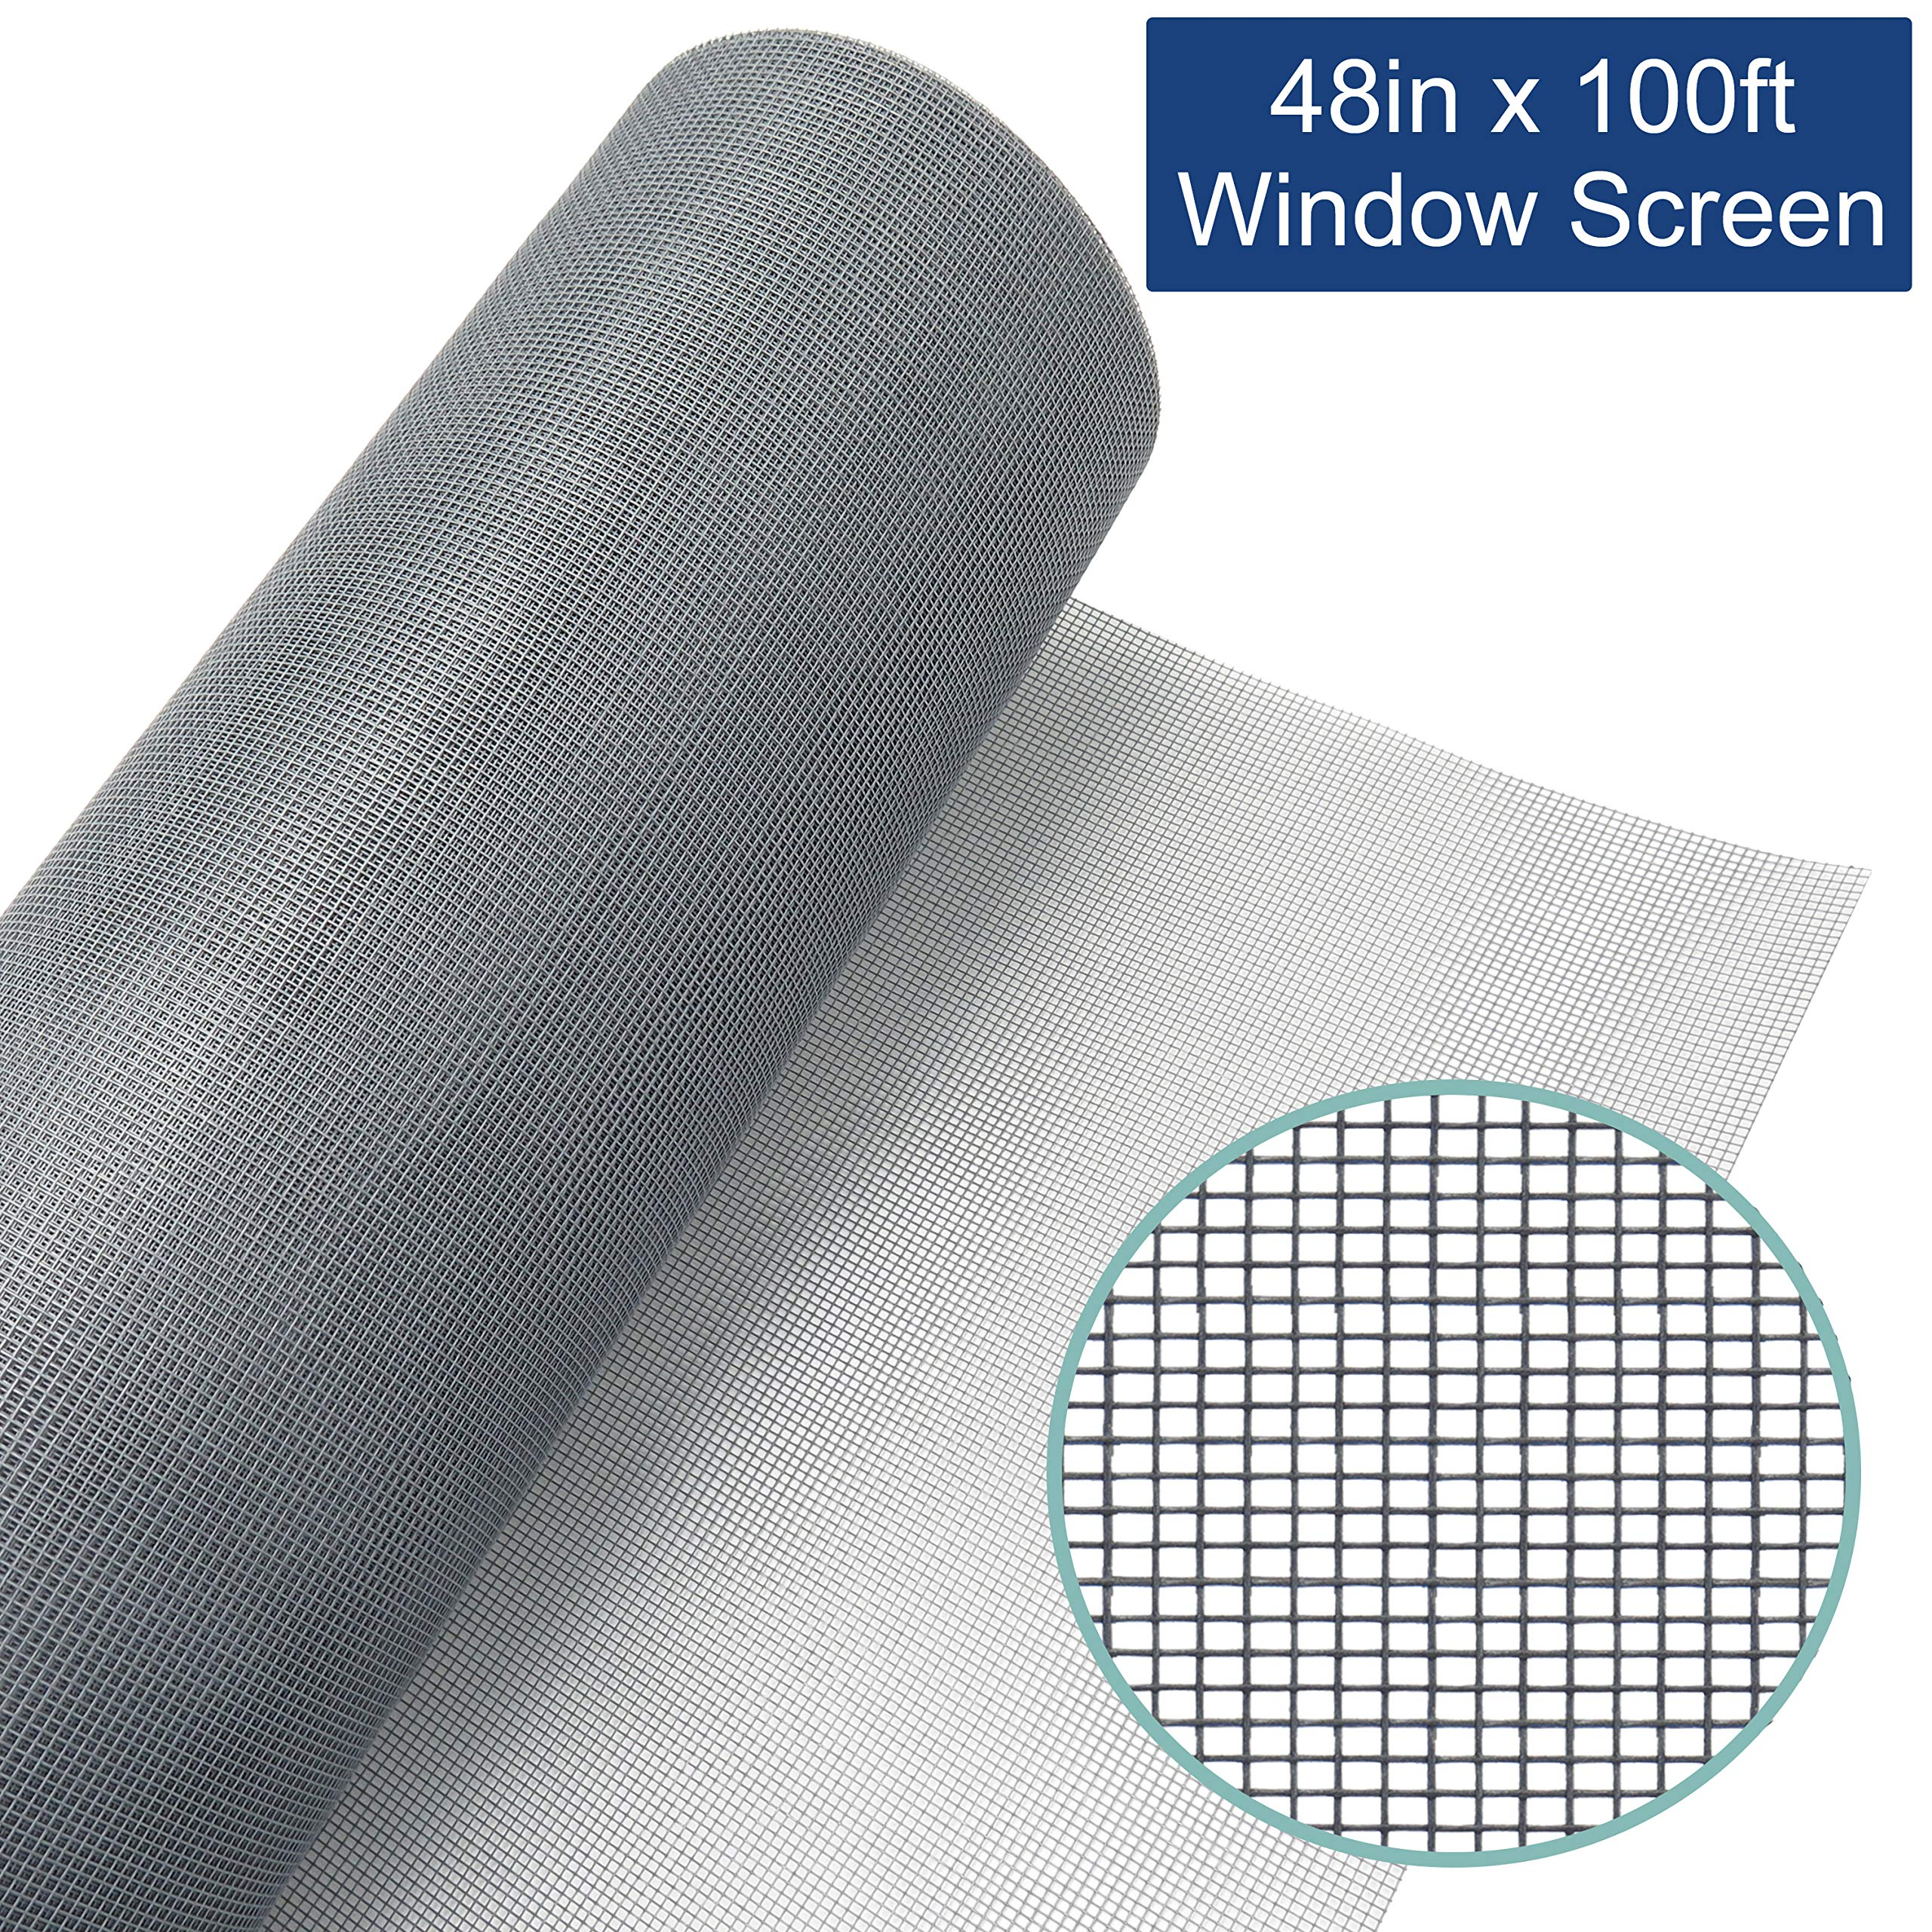 Window Screen Mesh Roll 48in x 100ft – Fiberglass Screen Replacement Mesh for DIY Projects (Grey Mesh)